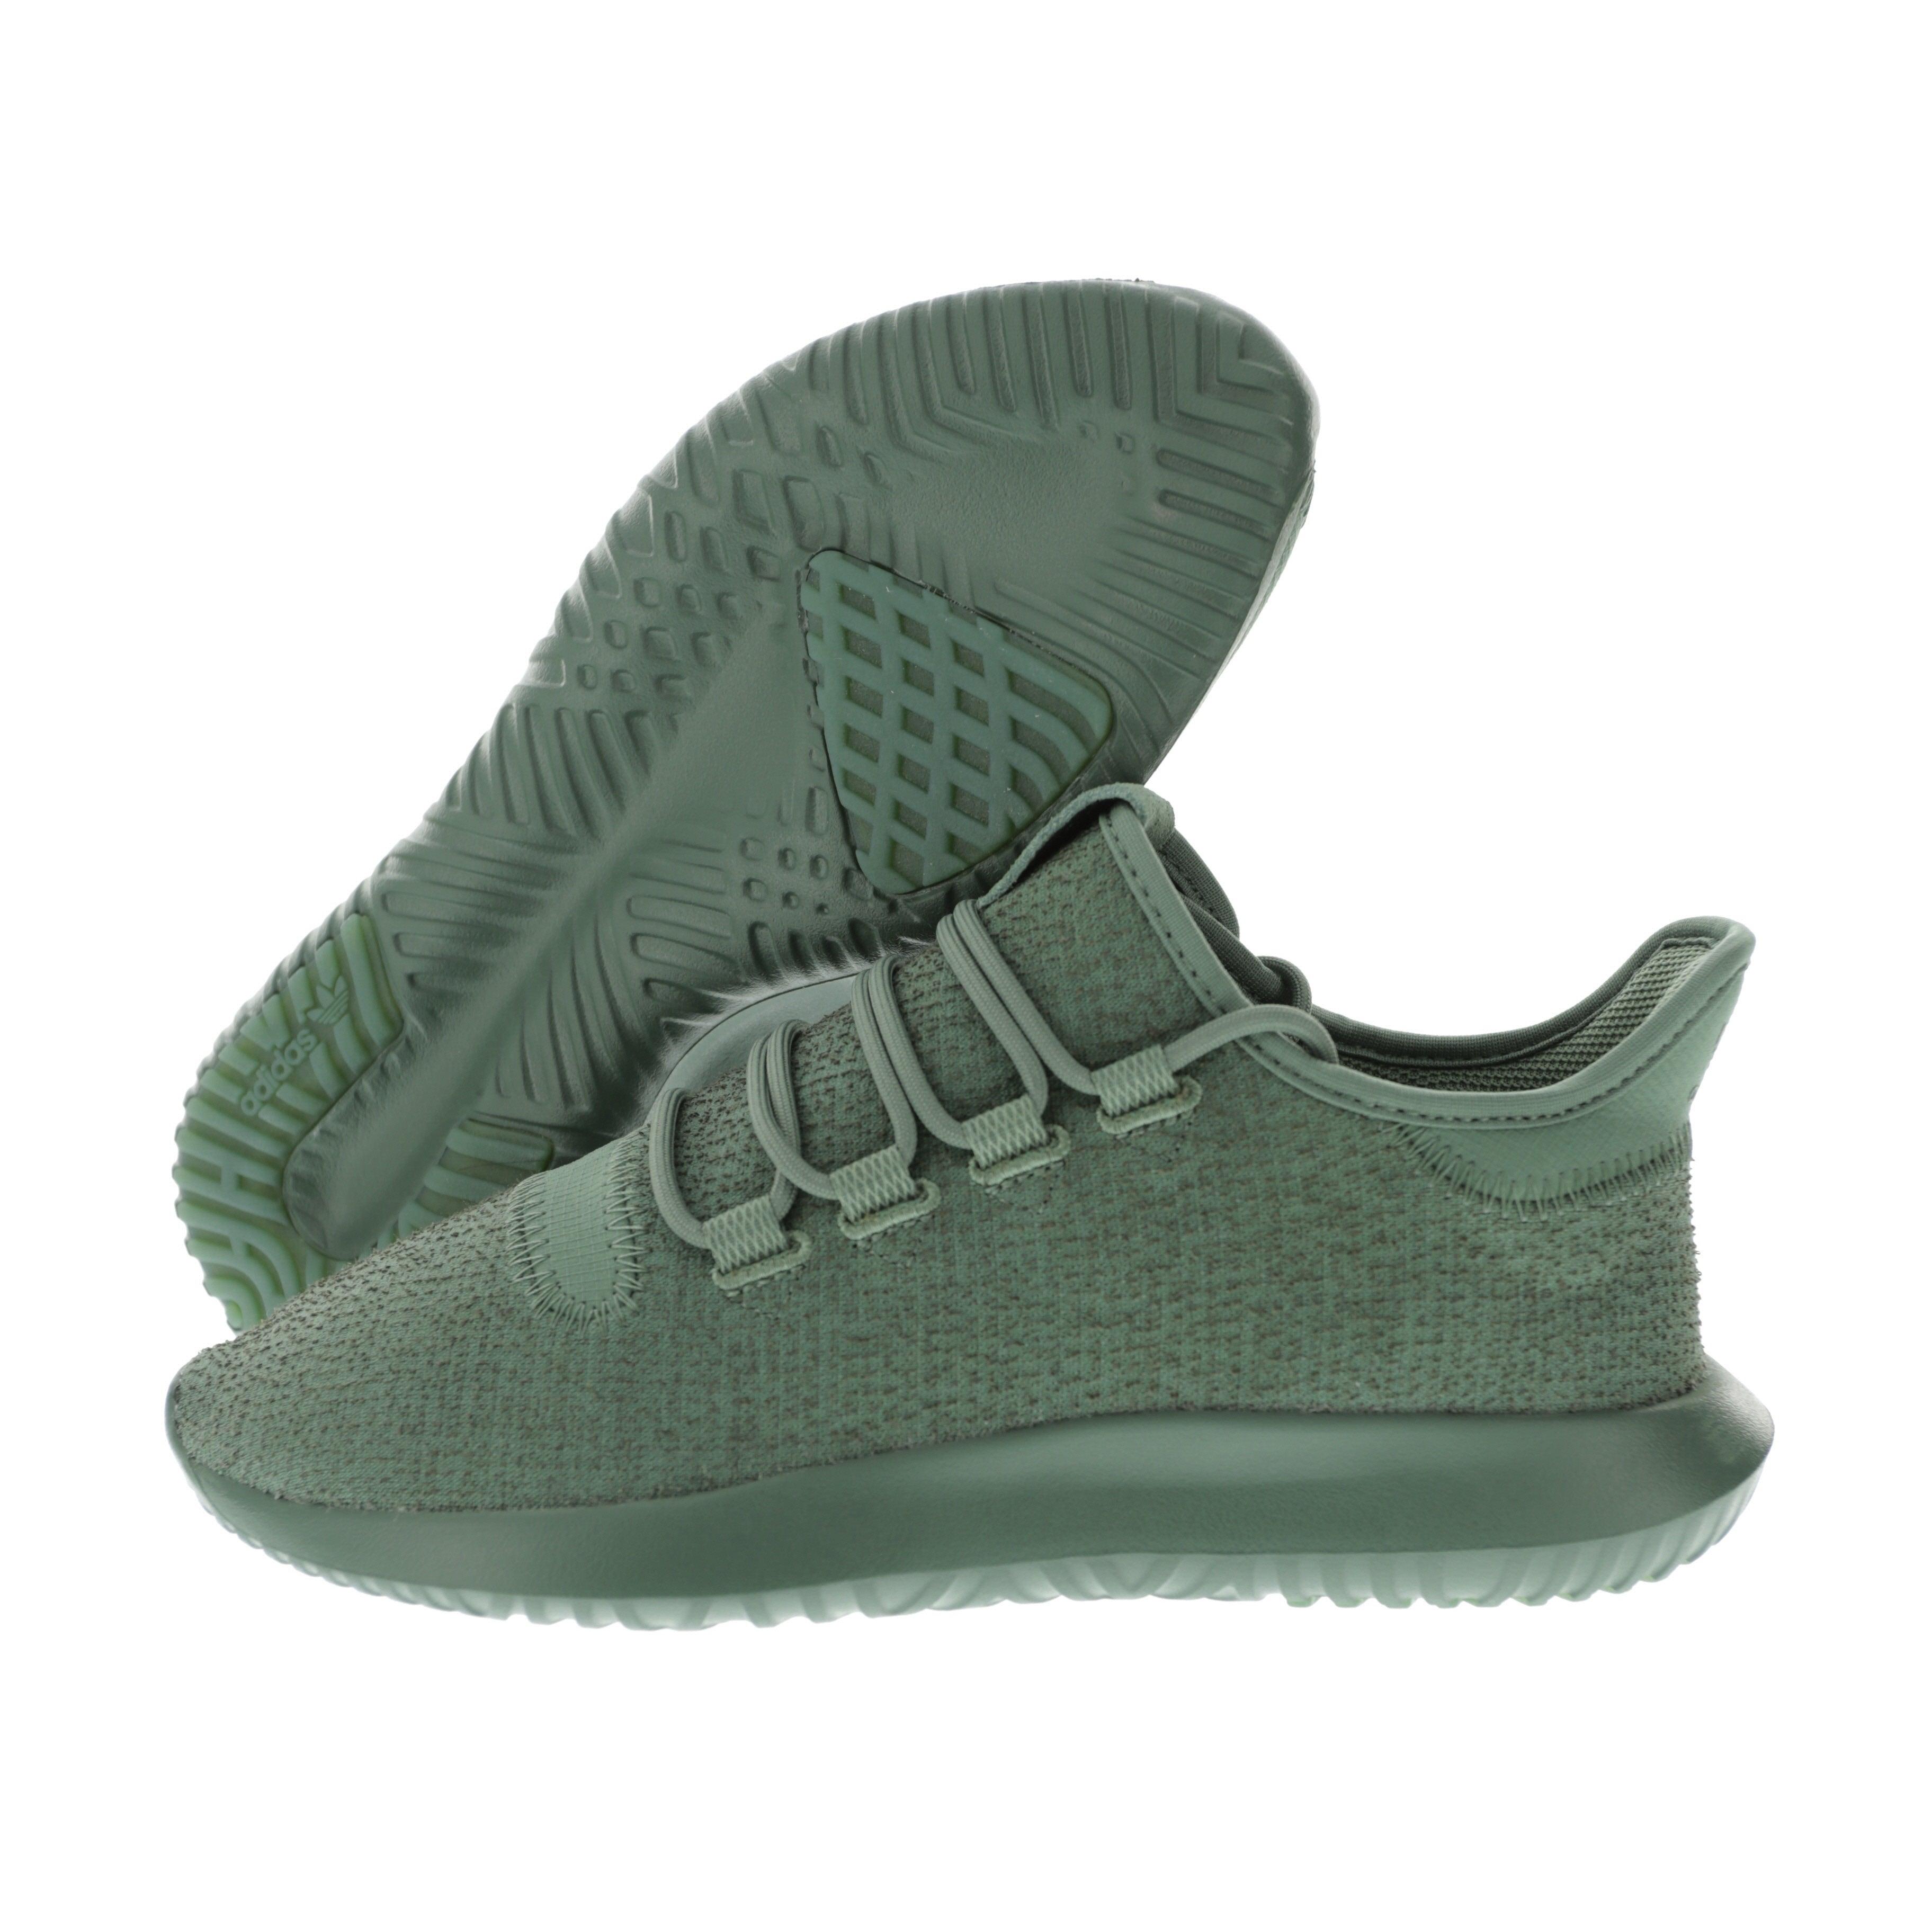 Adidas Originals Tubular Shadow Green